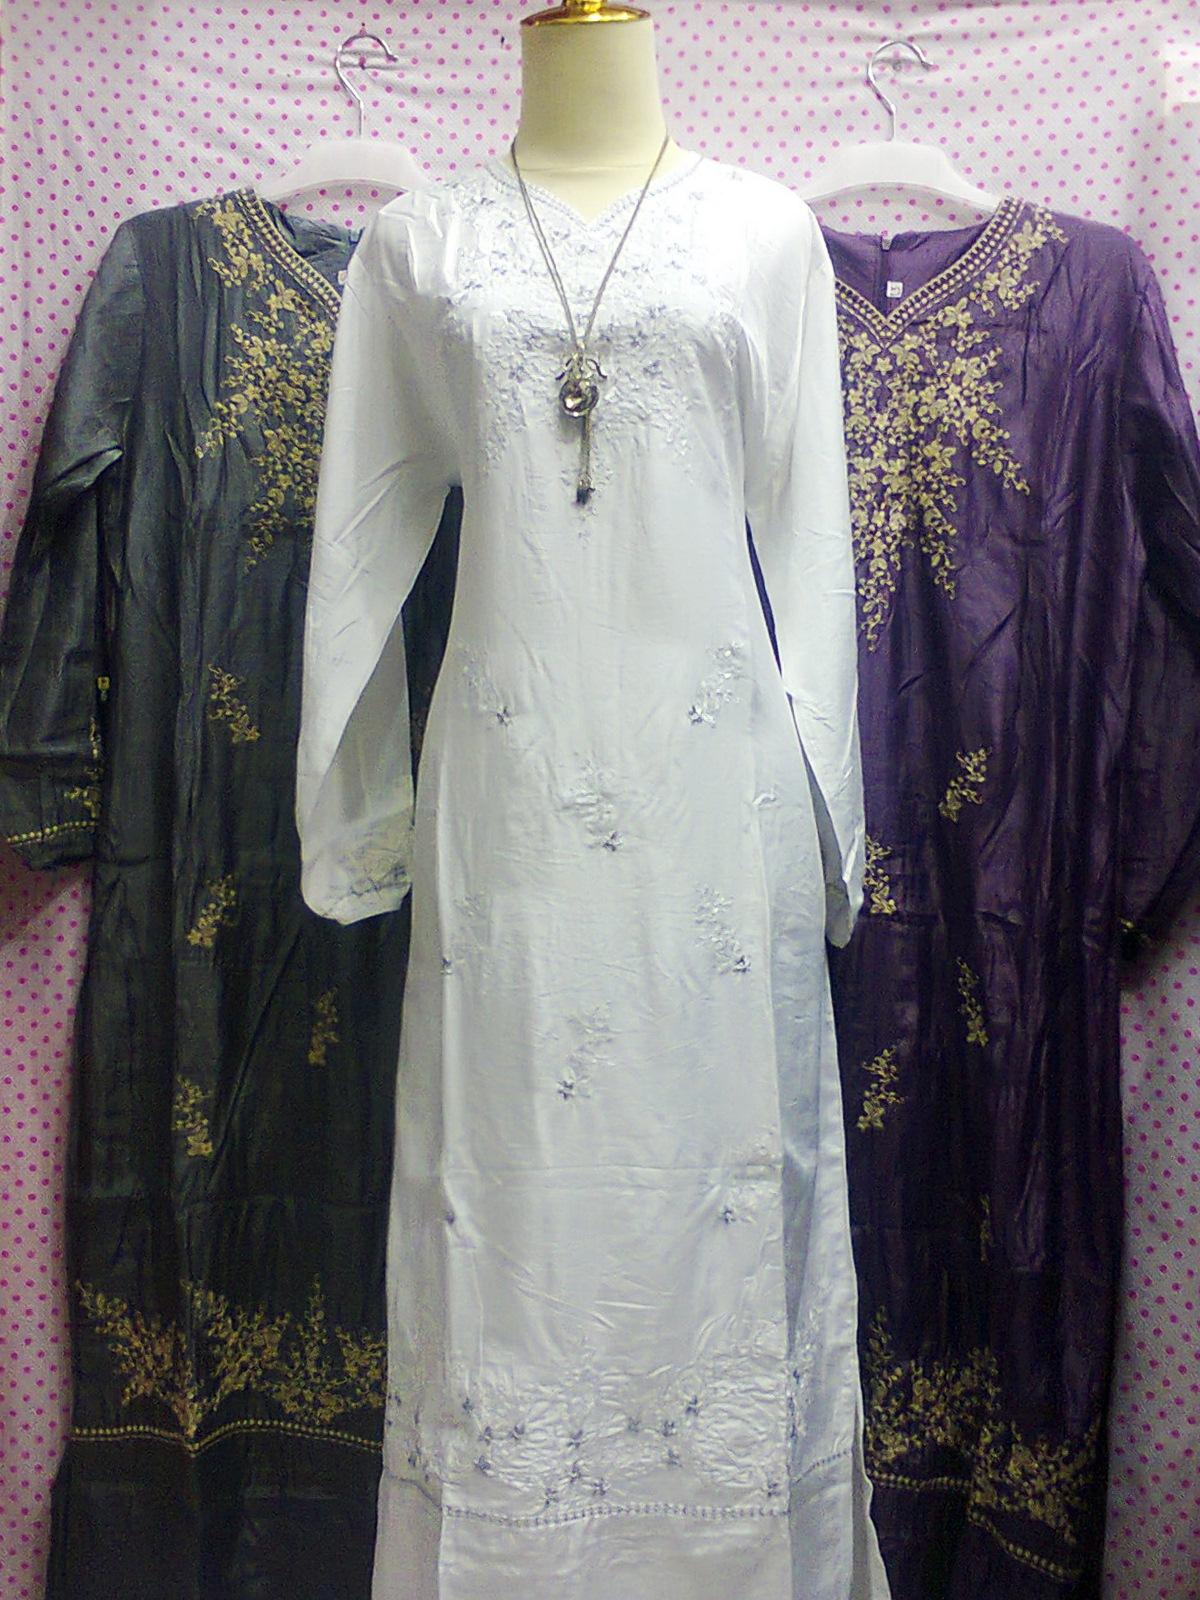 Bakrie Shop Gamis Sutra Sulam Idr